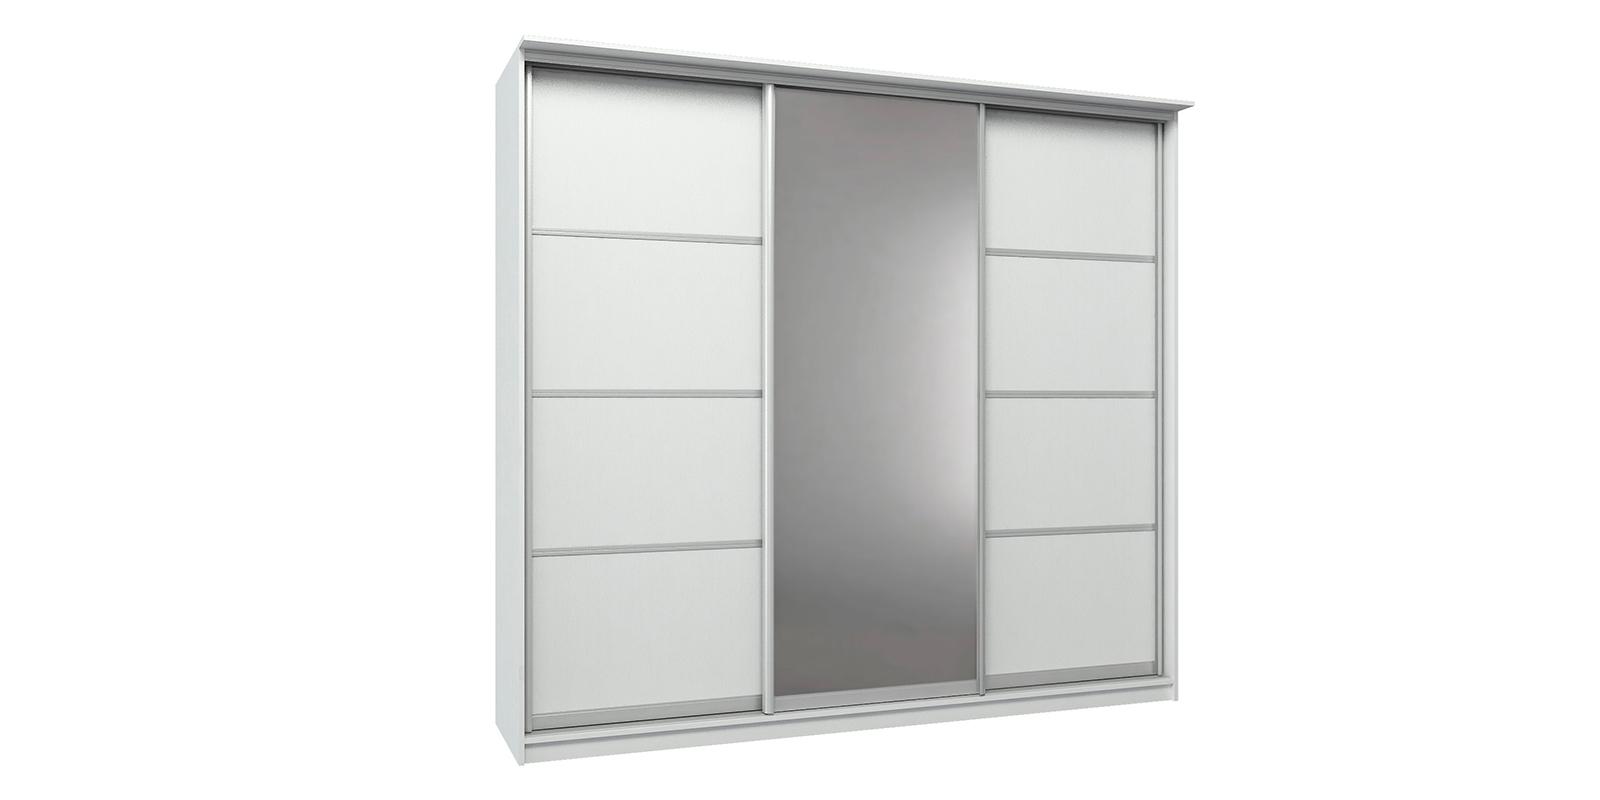 Шкаф-купе трехдверный Манчестер 260 см (белый+зеркало) Манчестер